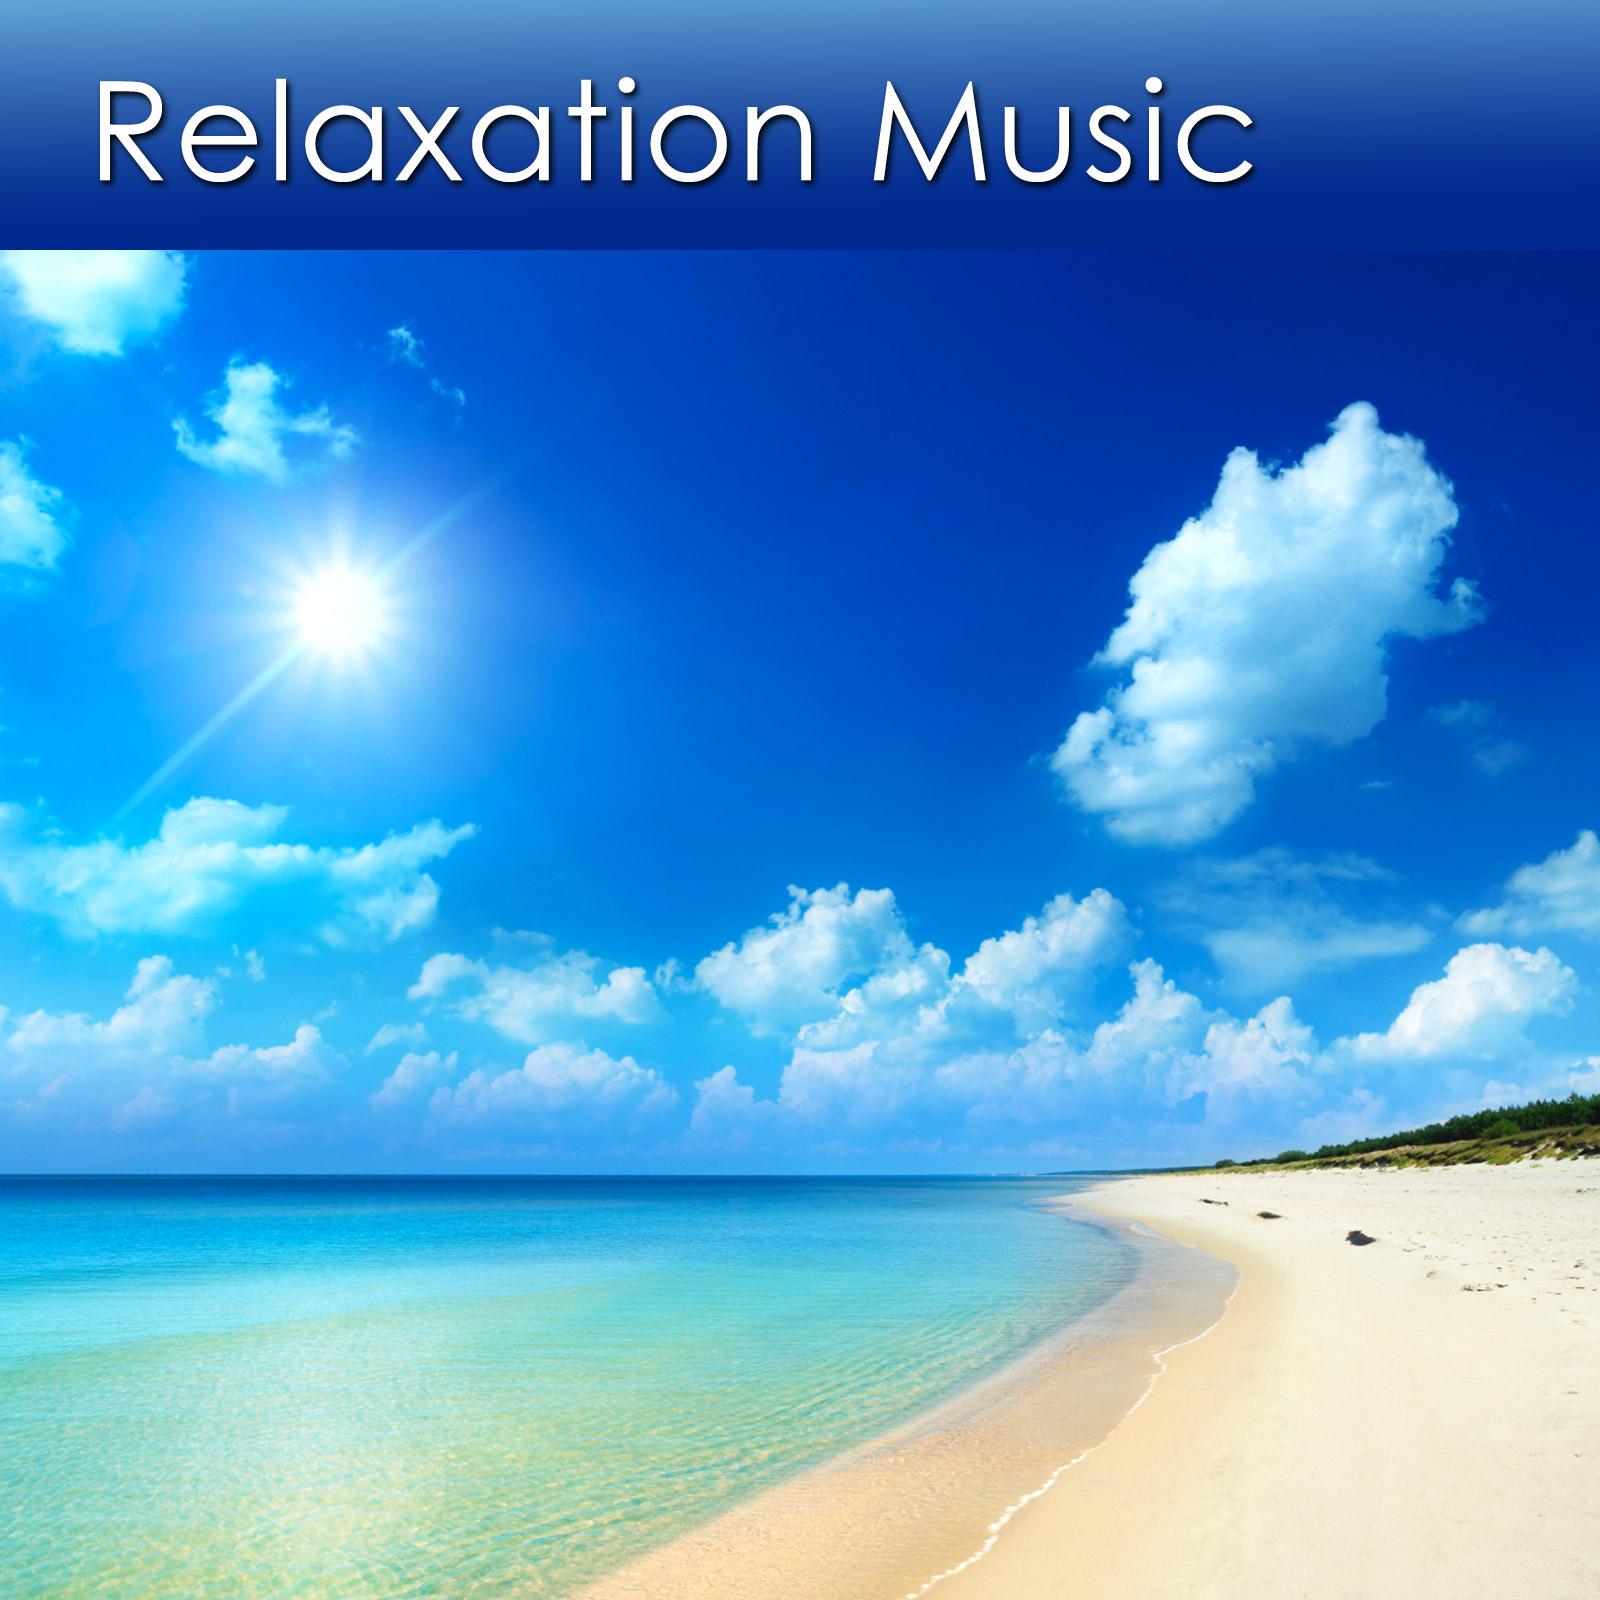 Relaxation-Music1600x1600-4.jpg